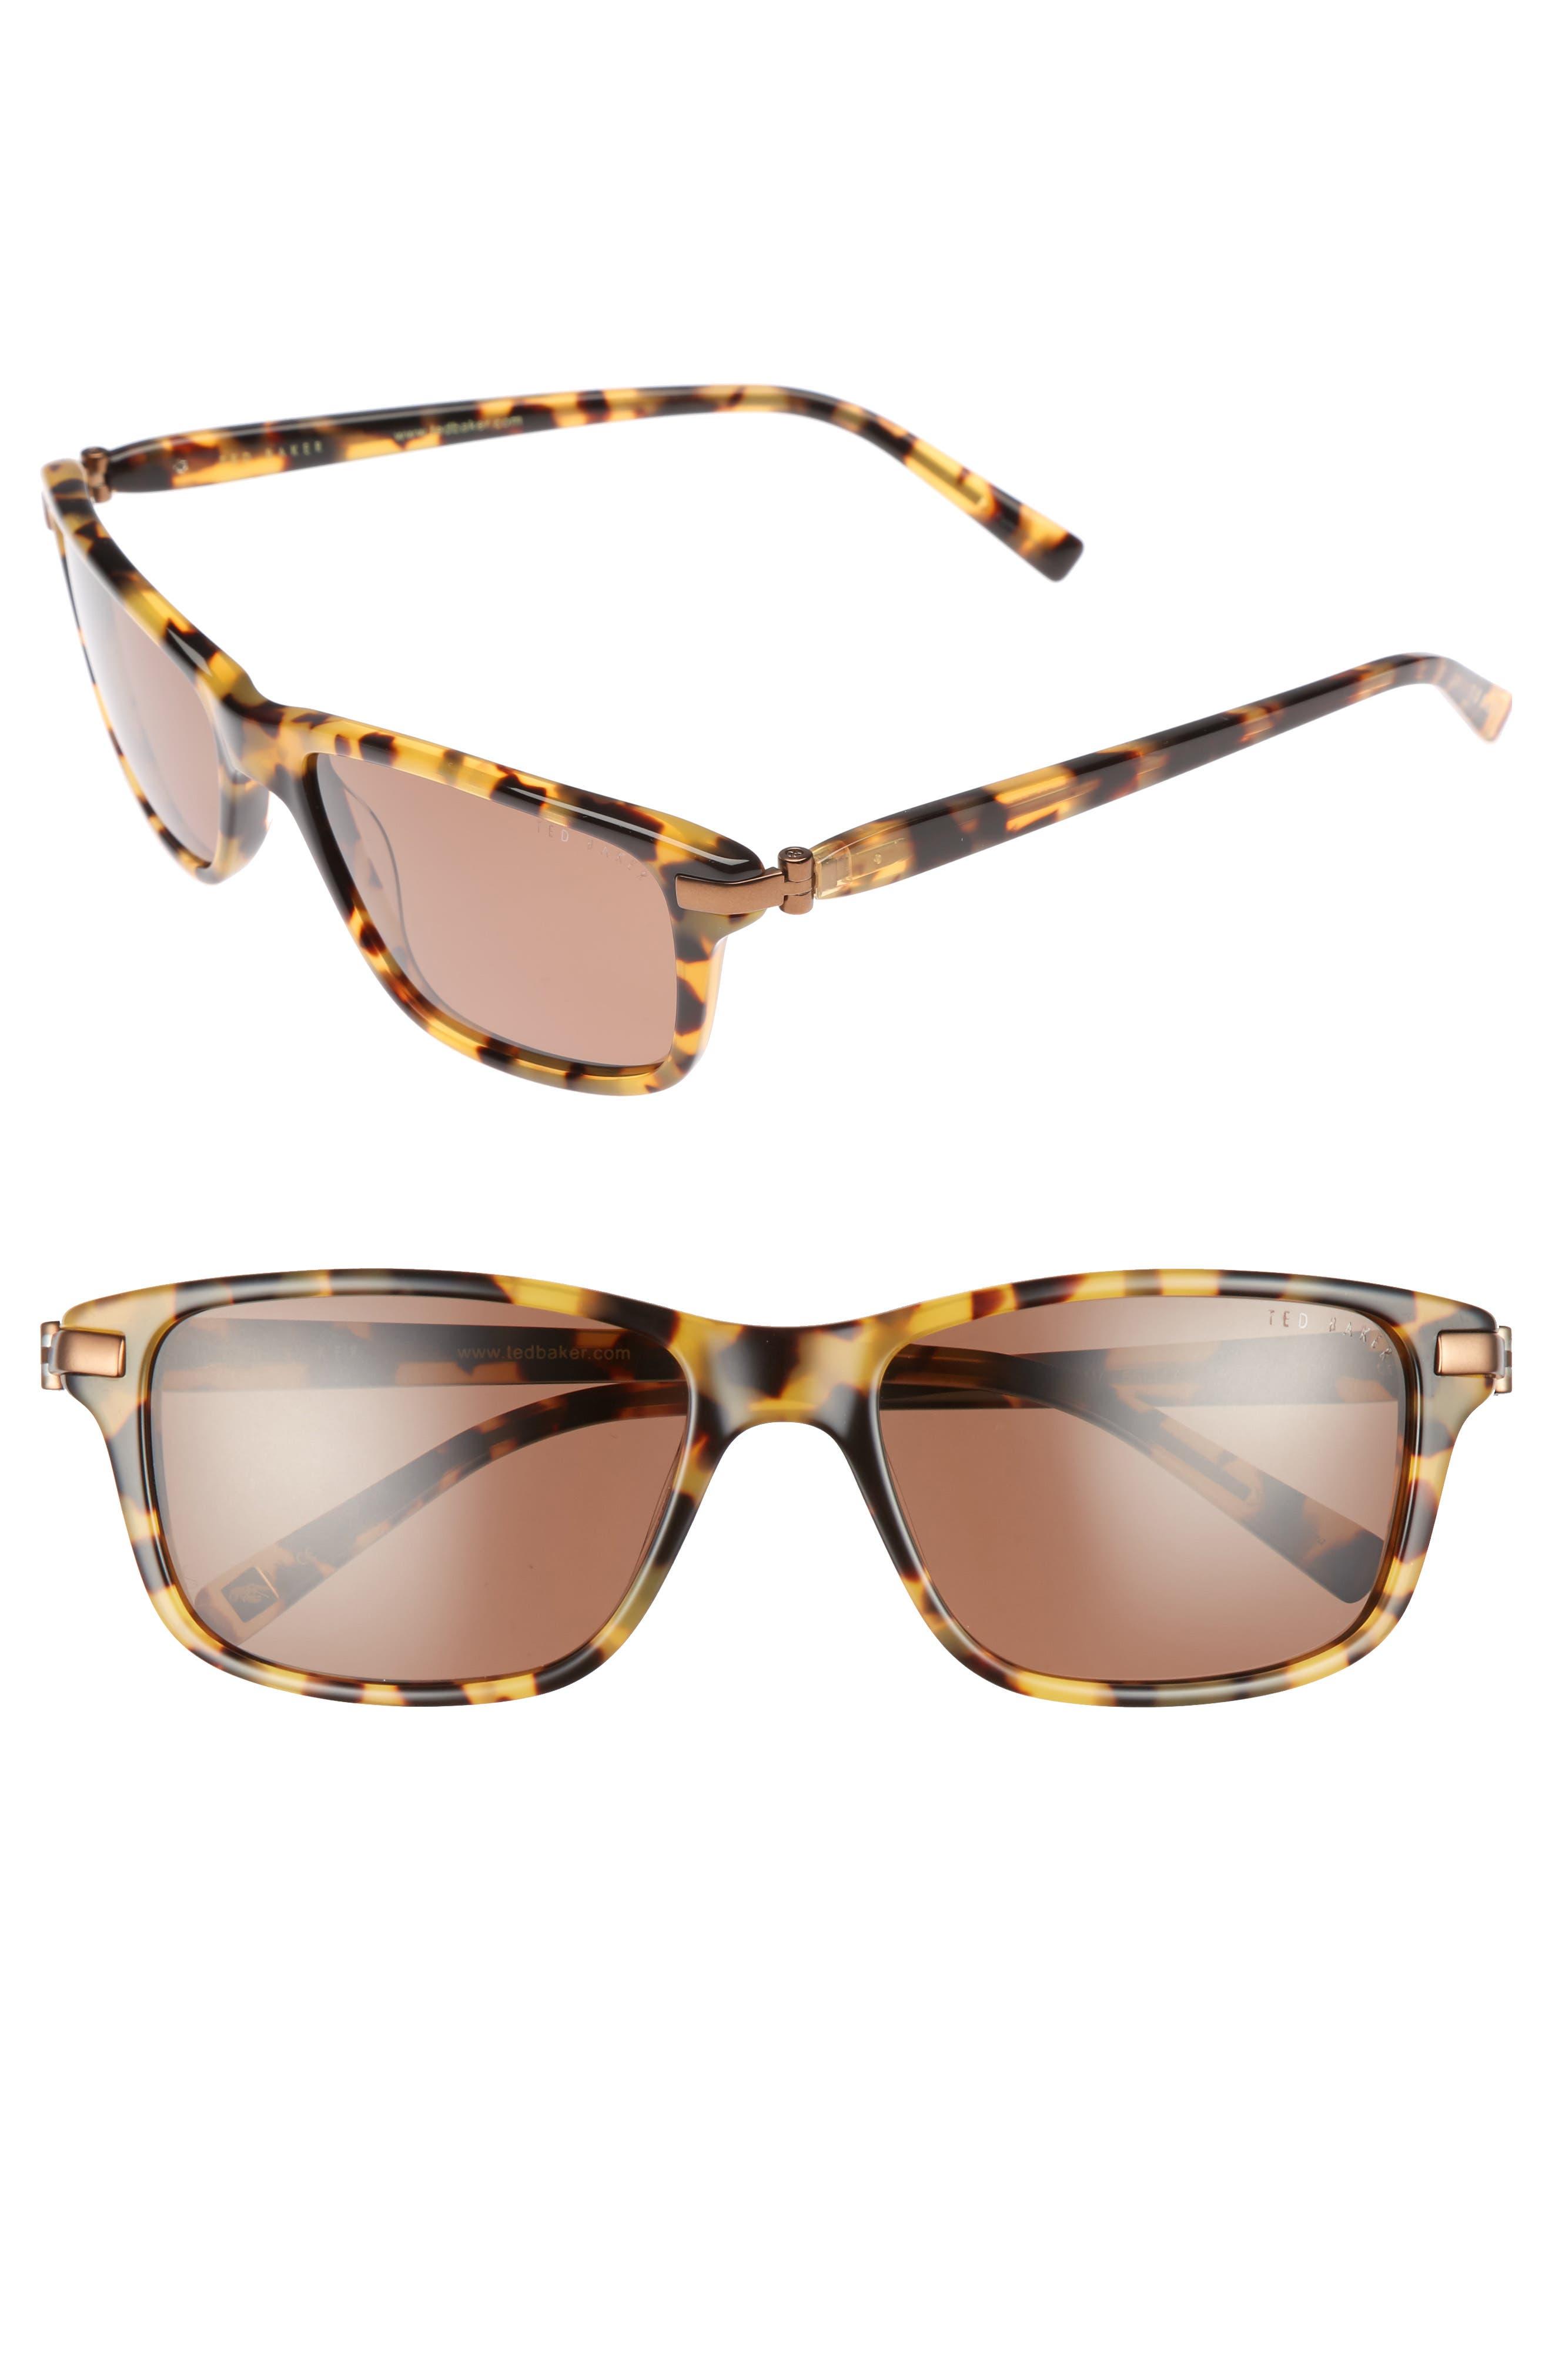 55mm Polarized Sunglasses,                             Main thumbnail 1, color,                             Havana